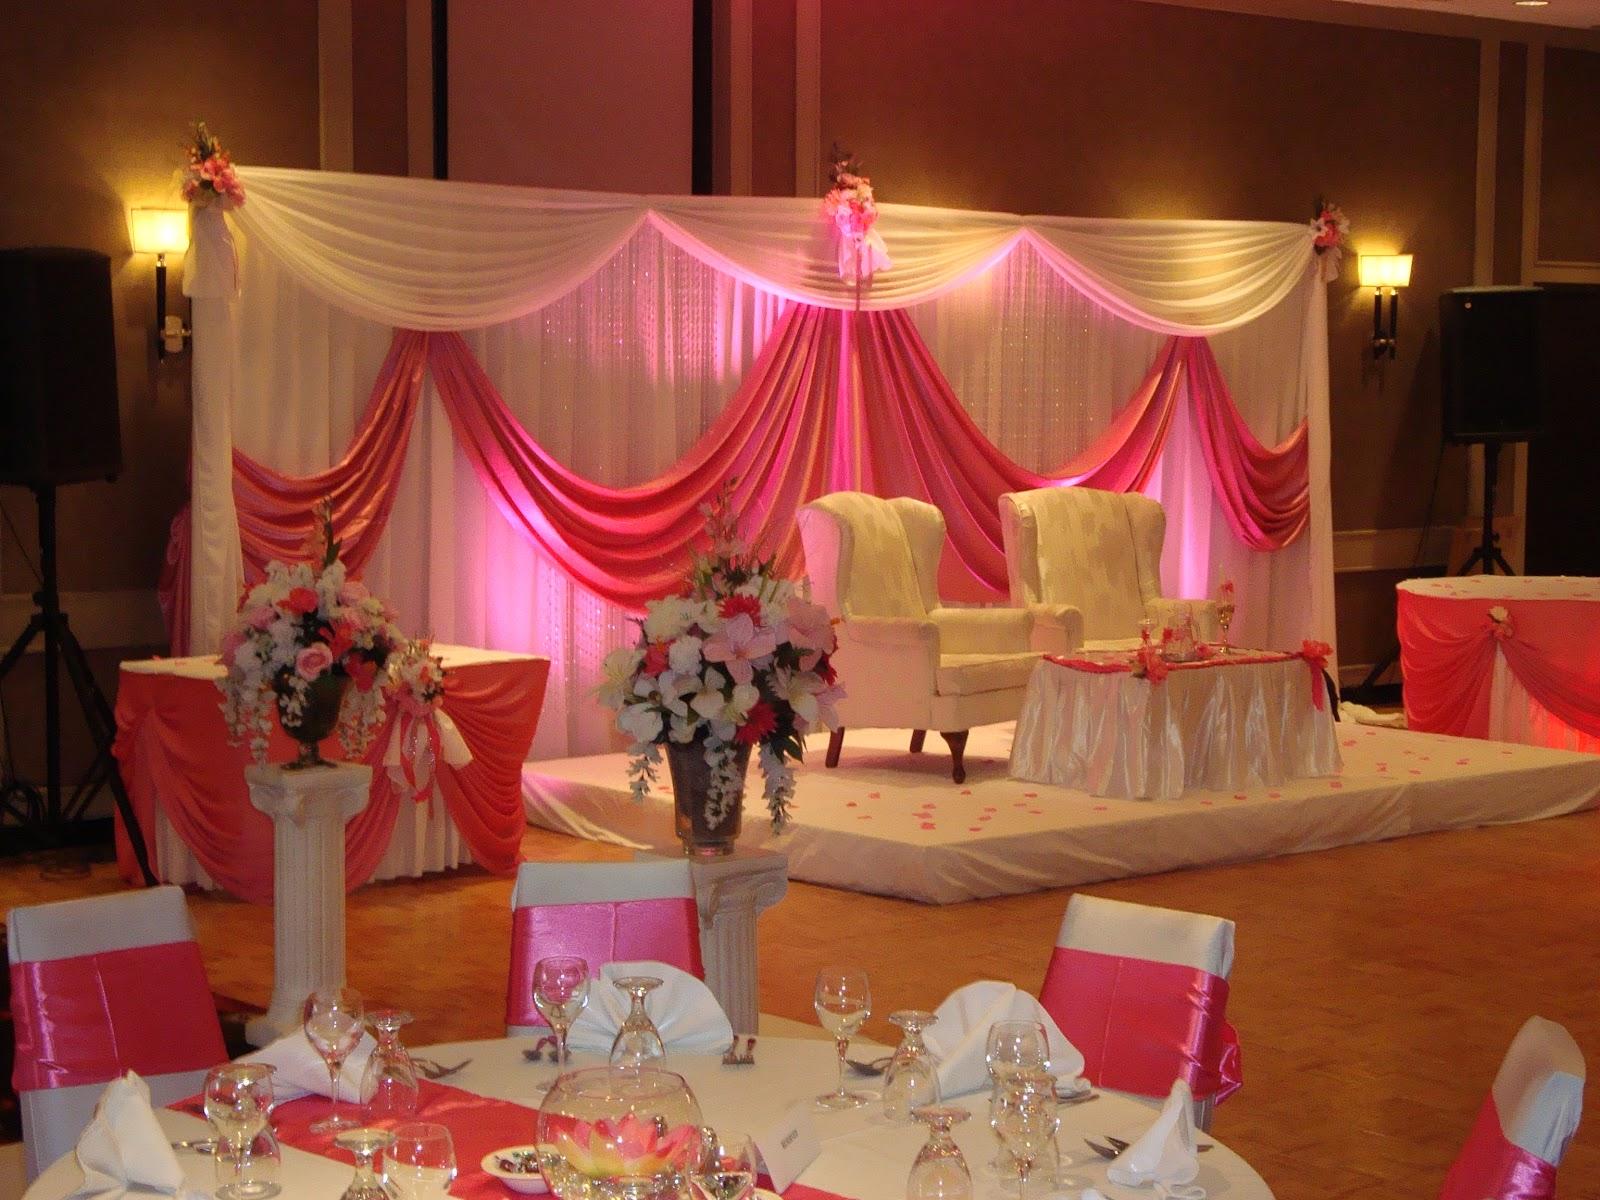 Wedding Decorations: Wedding Decorations, Wedding Ceremony Decorations, Wedding